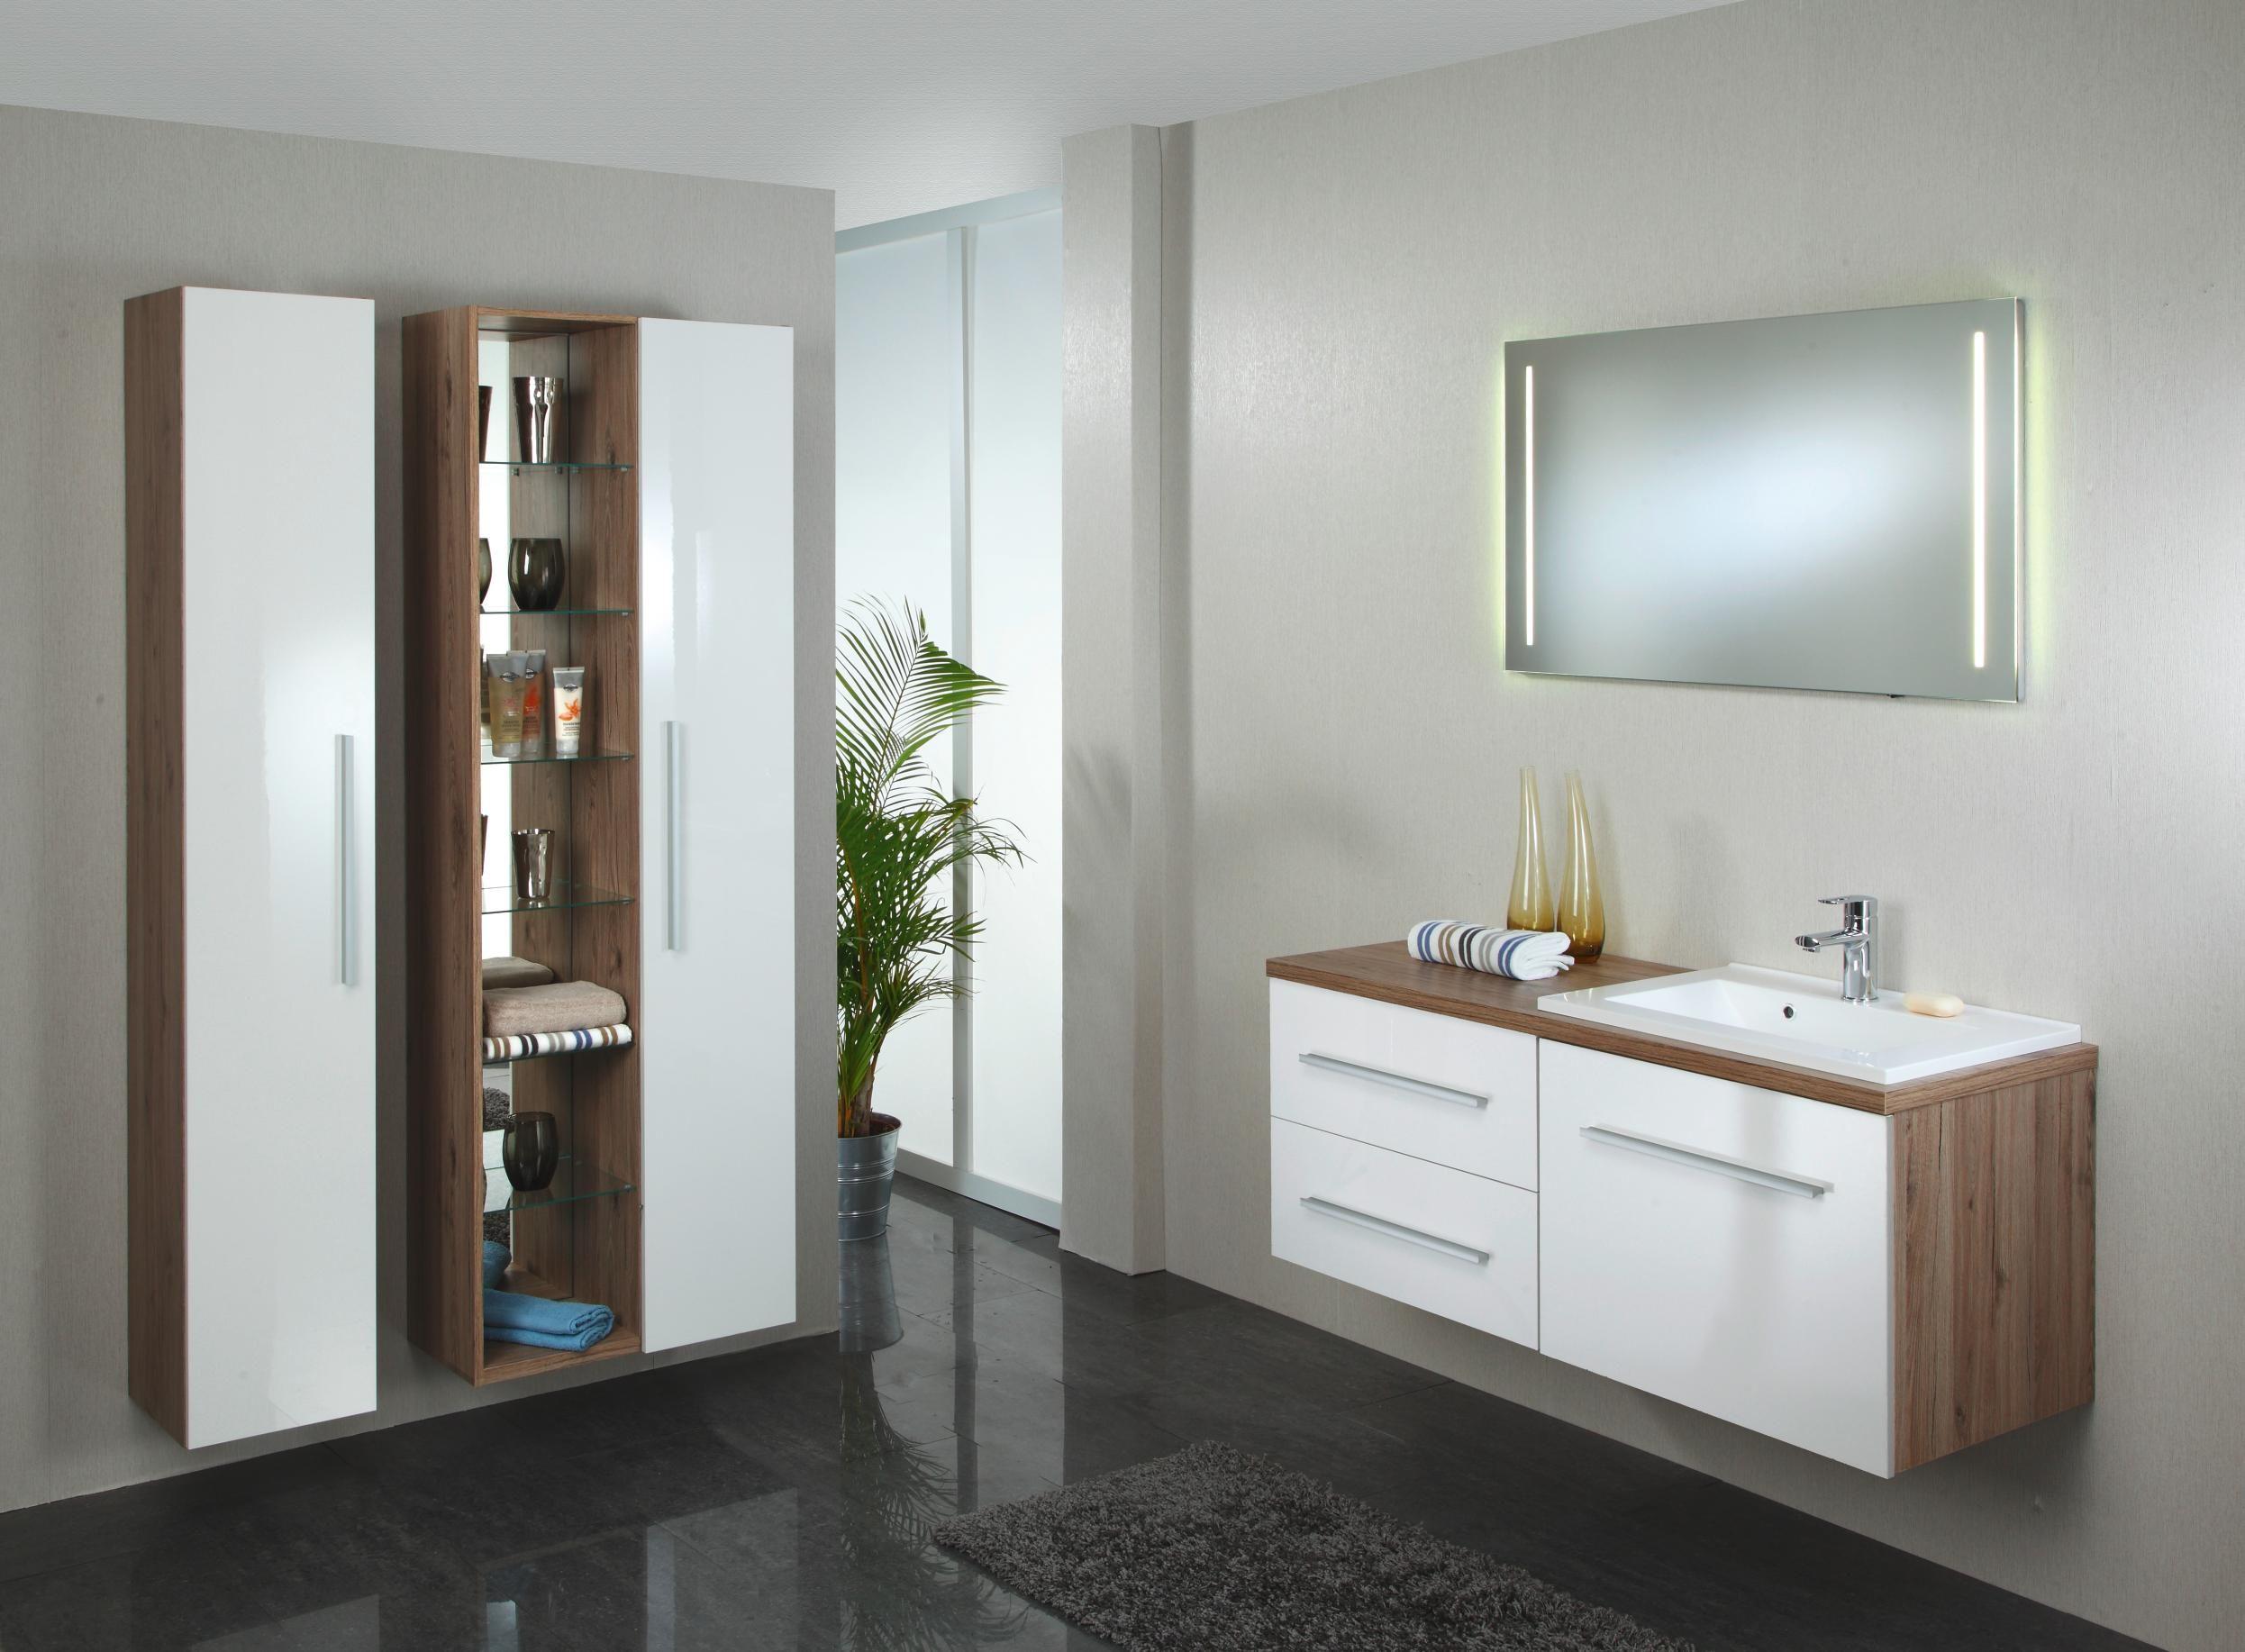 badezimmer brisbane von xora modernes design mit led beleuchtung badezimmer pinterest. Black Bedroom Furniture Sets. Home Design Ideas